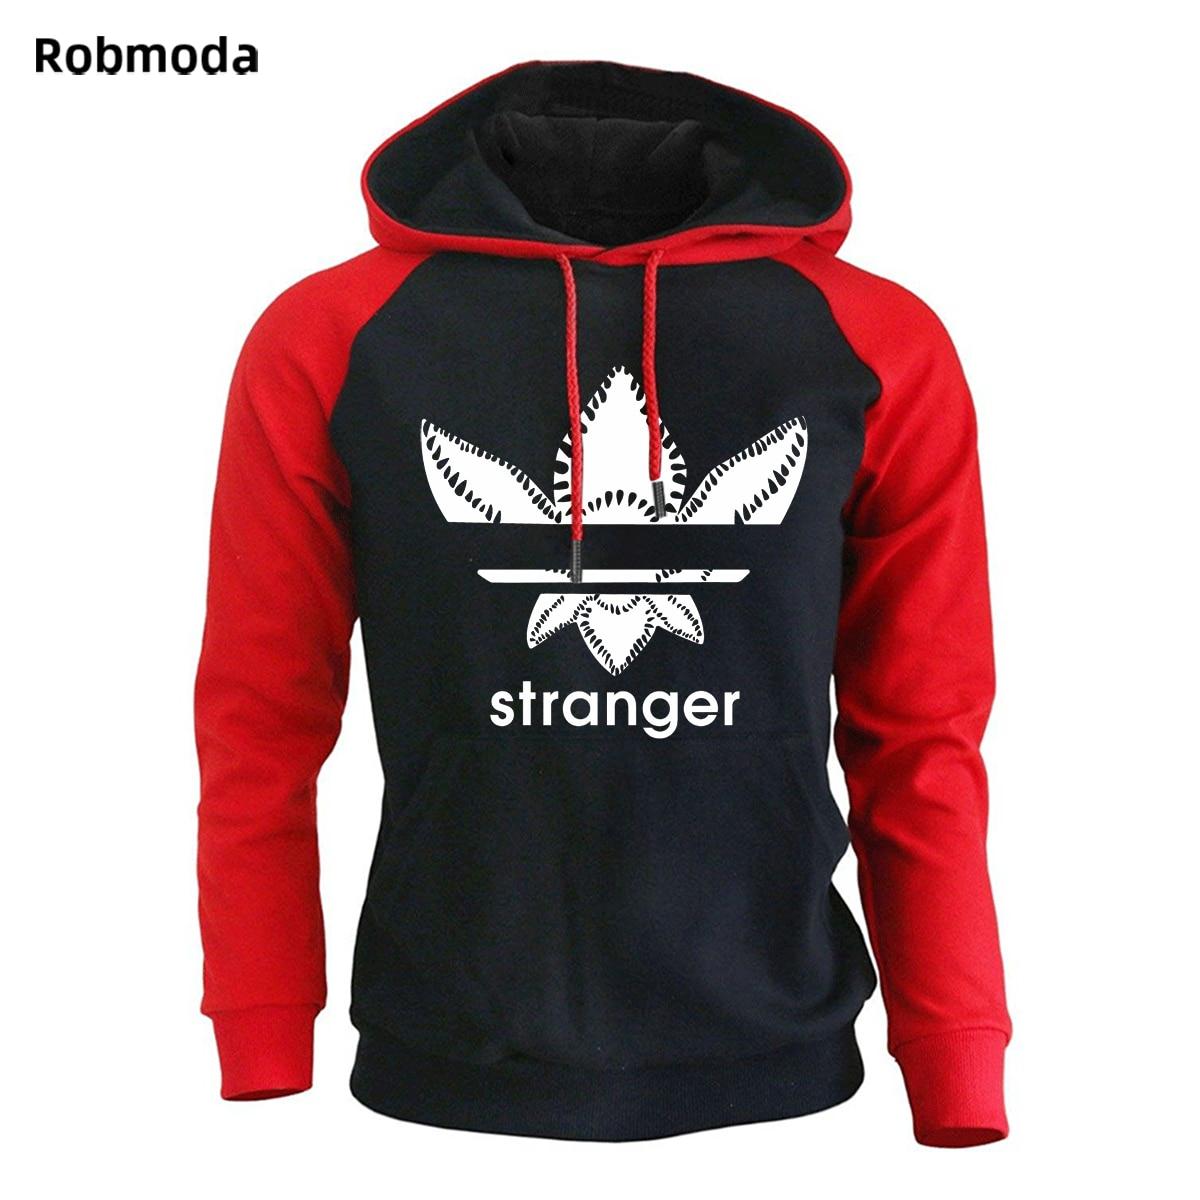 2018 Brand New Fashion Stranger Things Cap Clothing Hooded Sweatshirt hoodies Men Women Hip Hop Hoodies Plus Size Streetwear in Hoodies amp Sweatshirts from Men 39 s Clothing